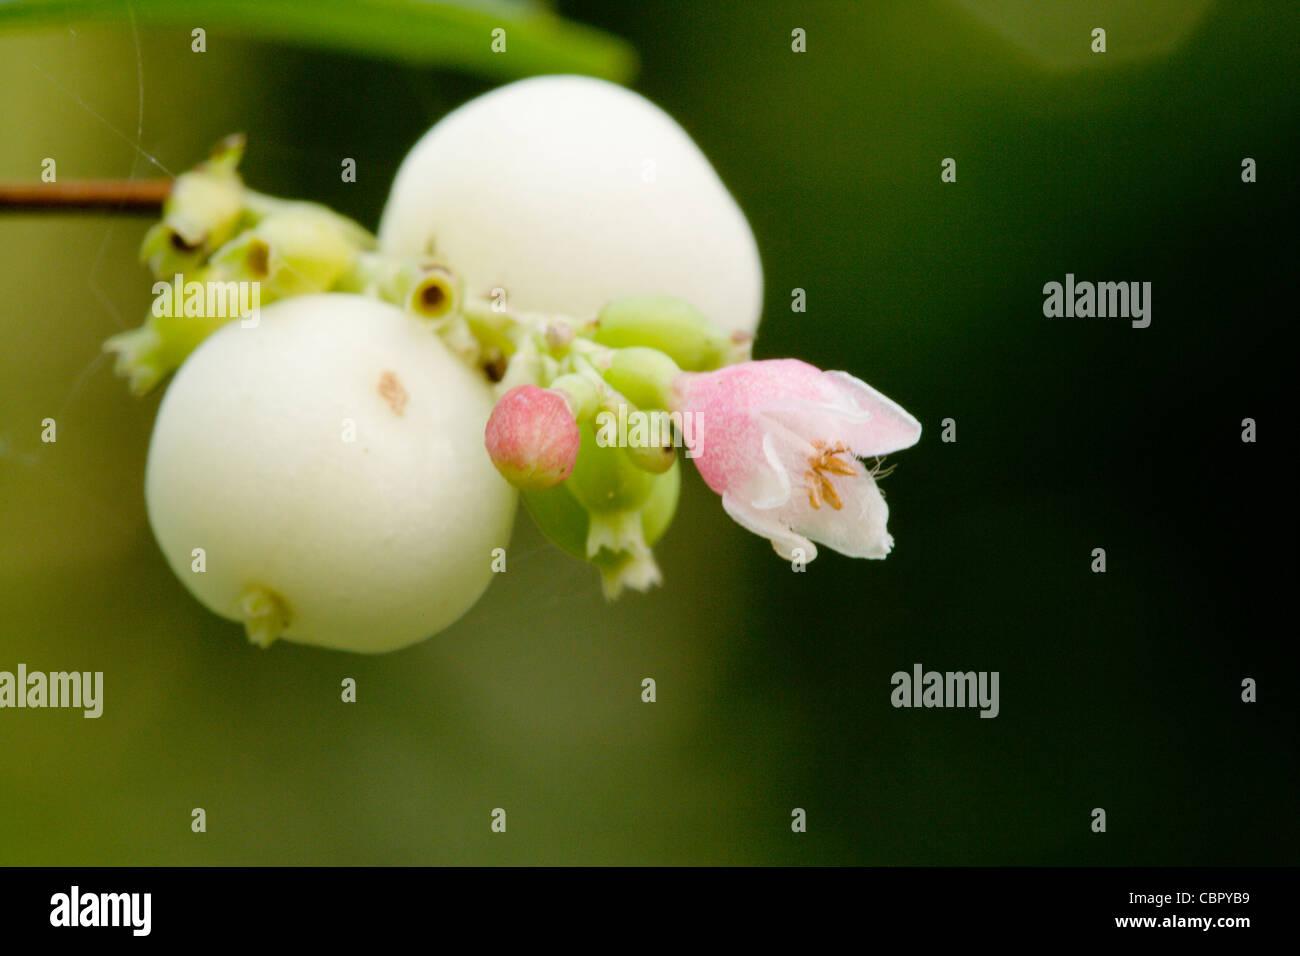 Snowberry, Symphoricarpos albus, berries and flowers. - Stock Image